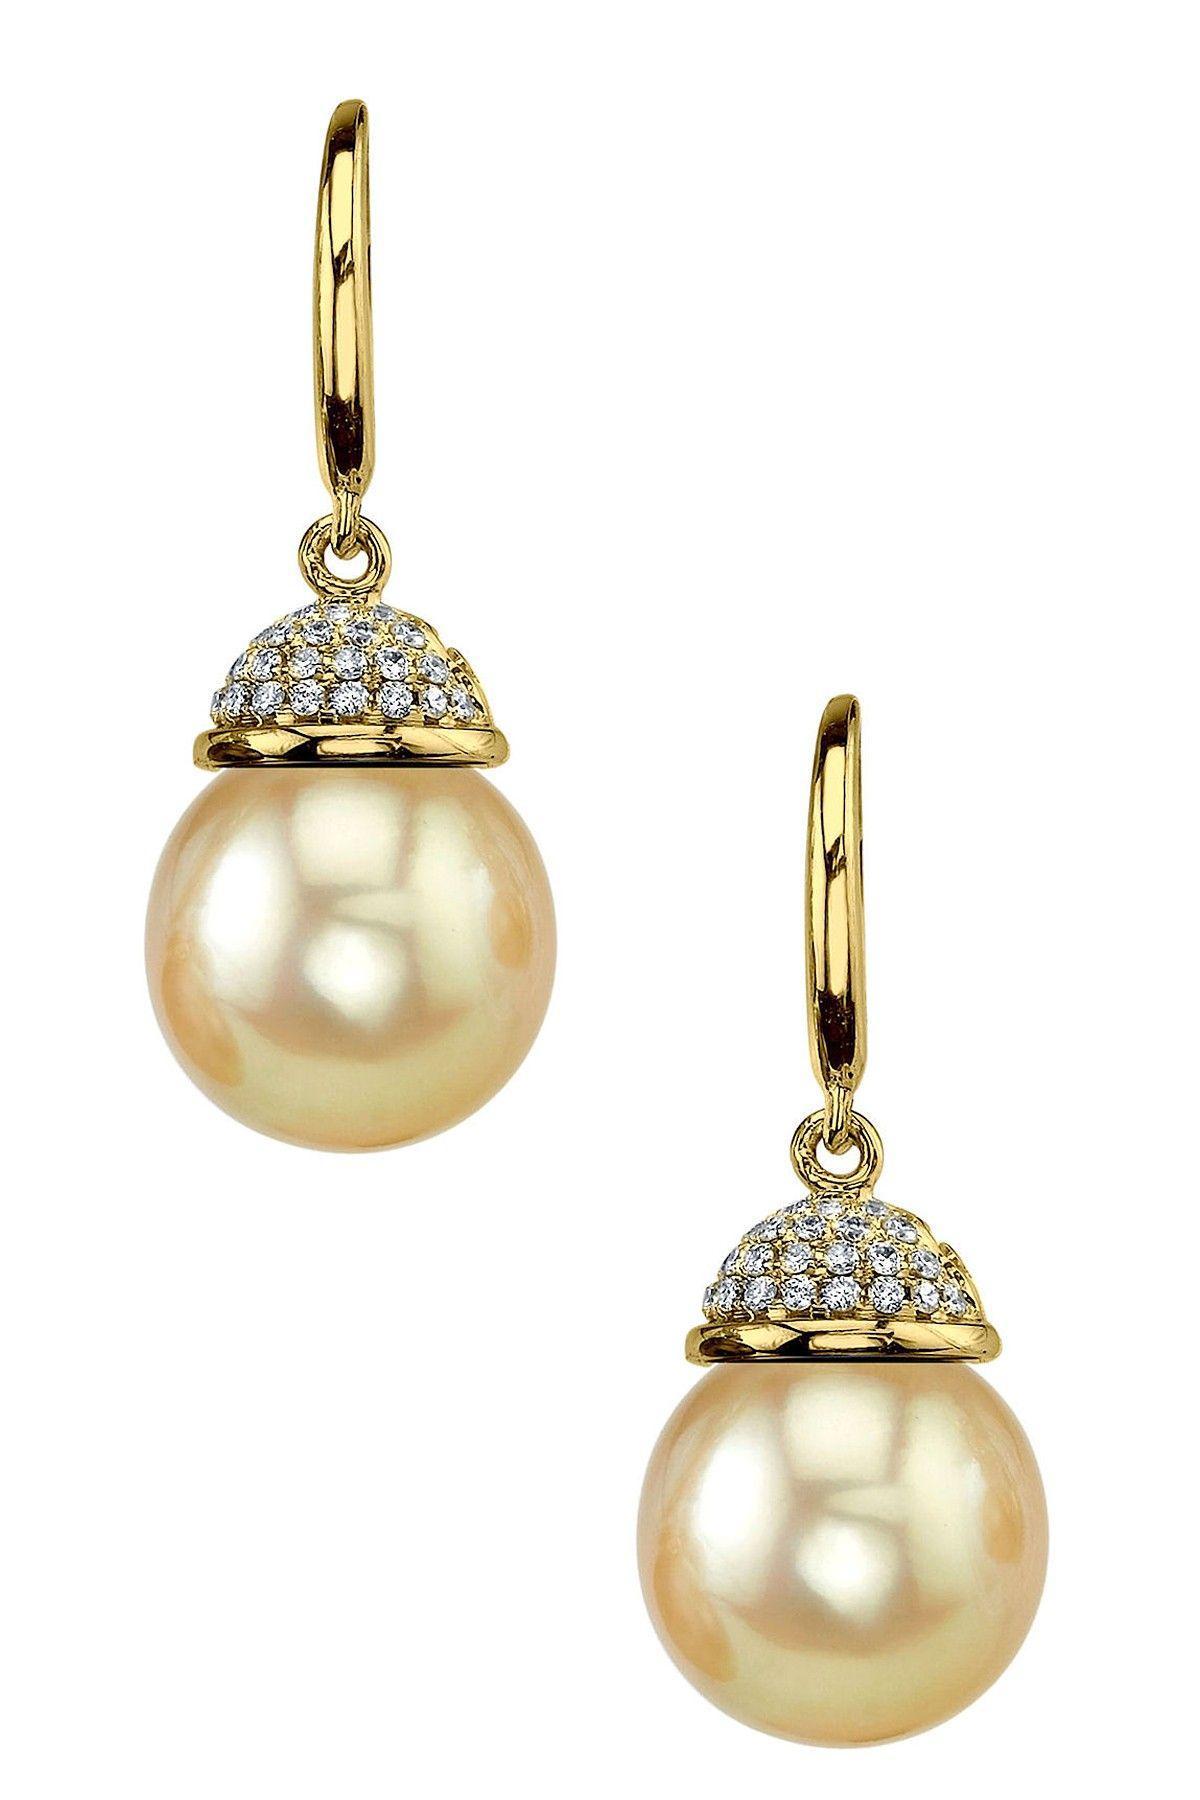 18K Yellow Gold 9mm Golden South Sea Pearl & Diamond Earrings - 0.07 ctw